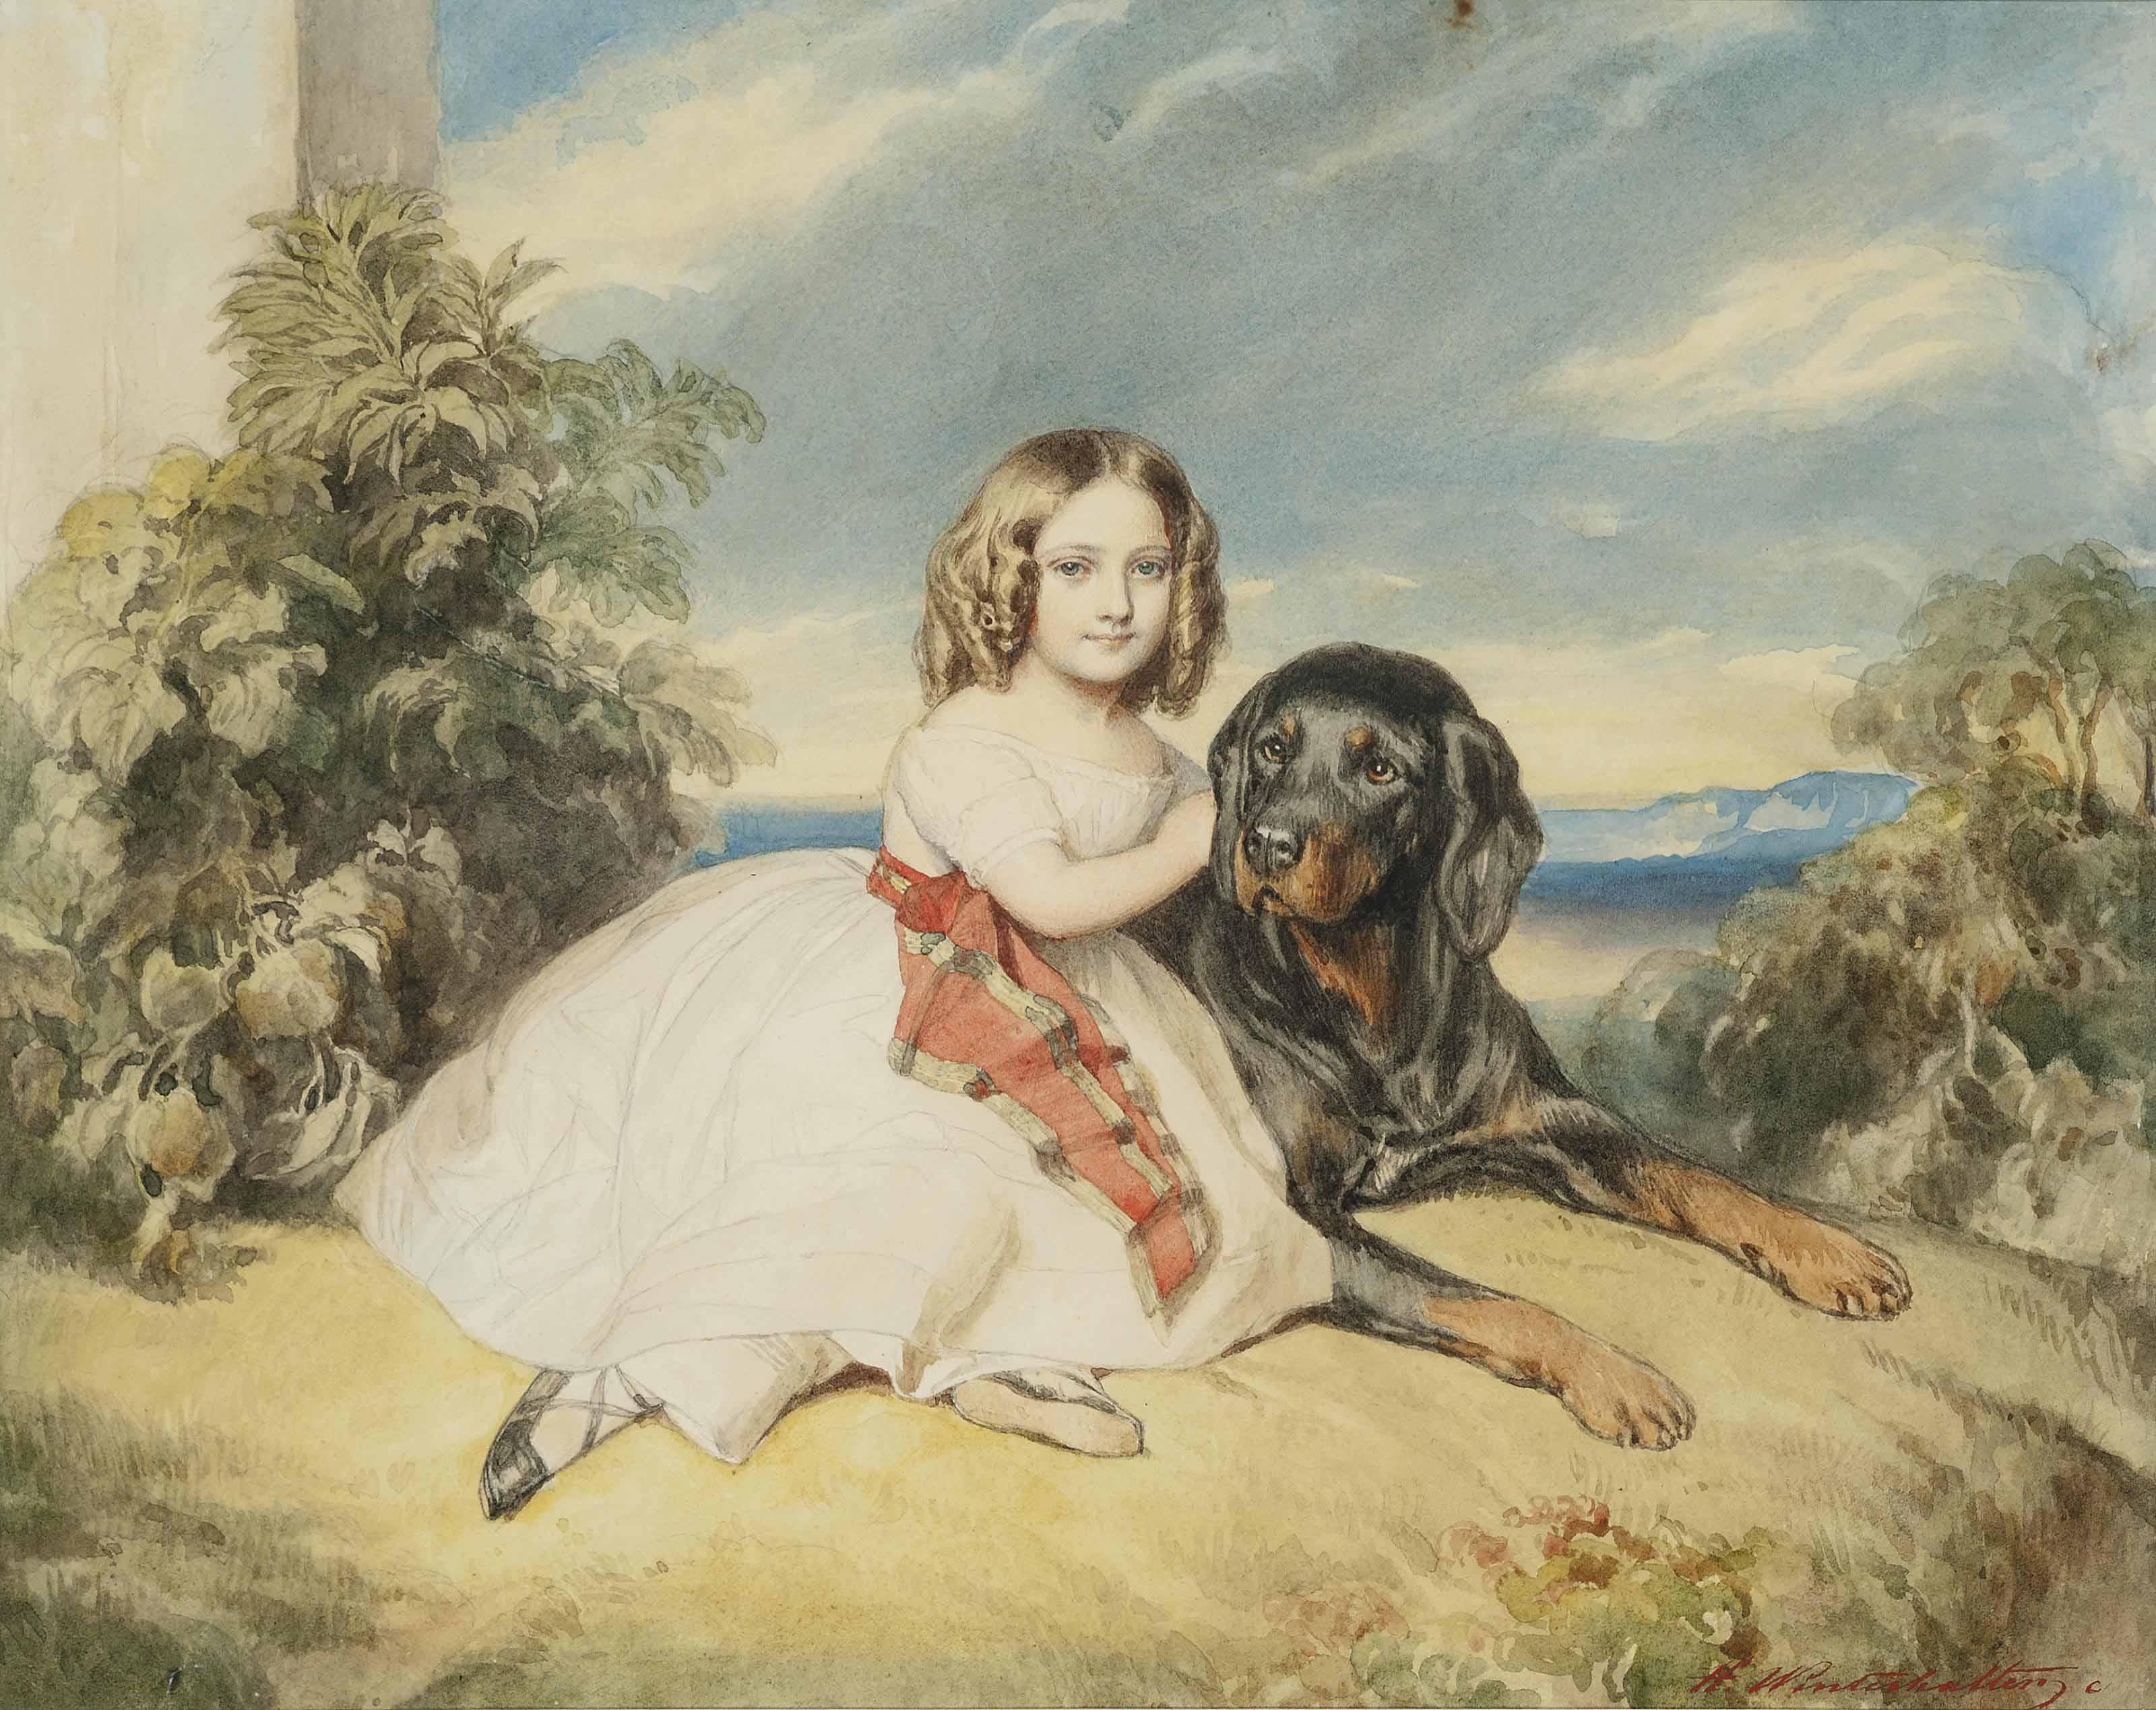 Portrait of Mlle Virginie de St-Aldegonde (1834-1900), later Duchesse de Rochechouart-Mortemart (after Franz Xaver Winterhalter)